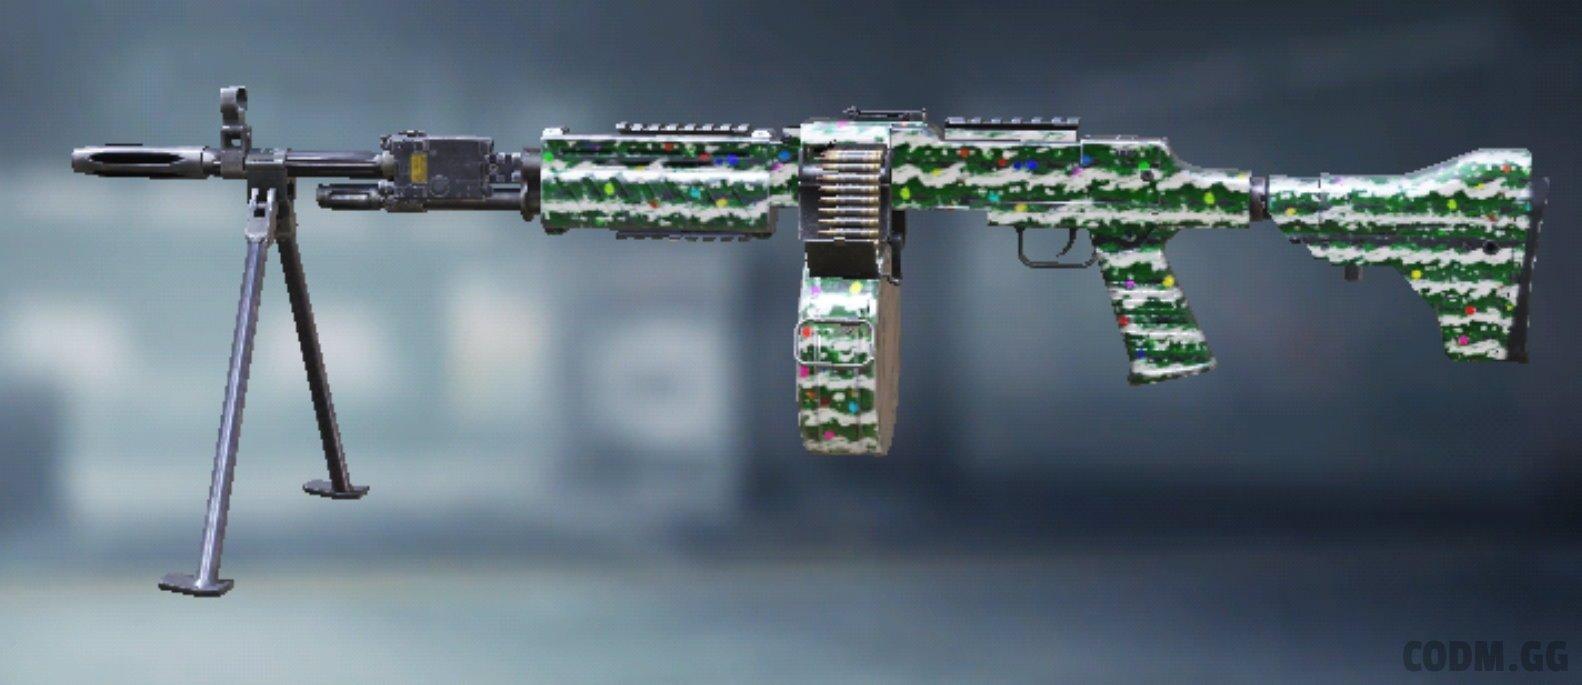 RPD Festive, Epic camo in Call of Duty Mobile